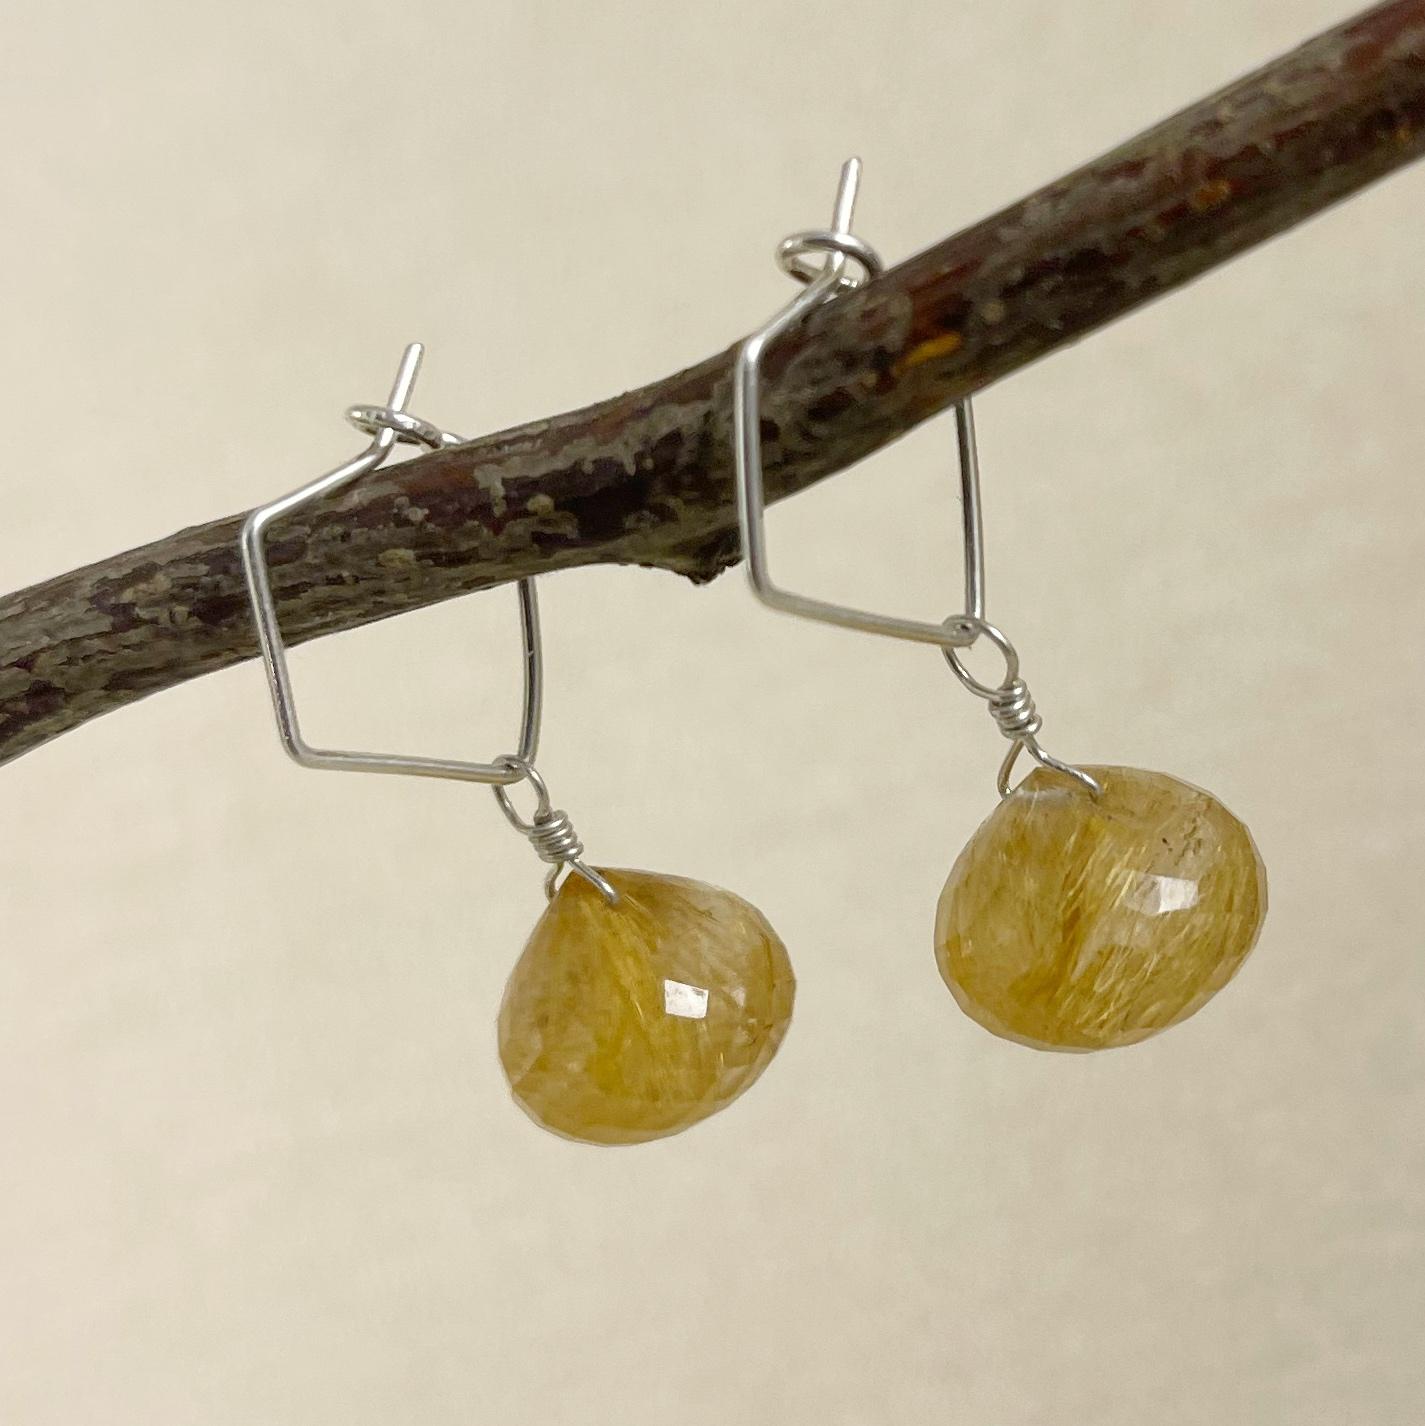 Natural Golden Rutilated Quartz Briolettes Smooth Pear Shape 10-15 MM Rutilated Quartz Briolettes Jewellery Making Gemstone Supply